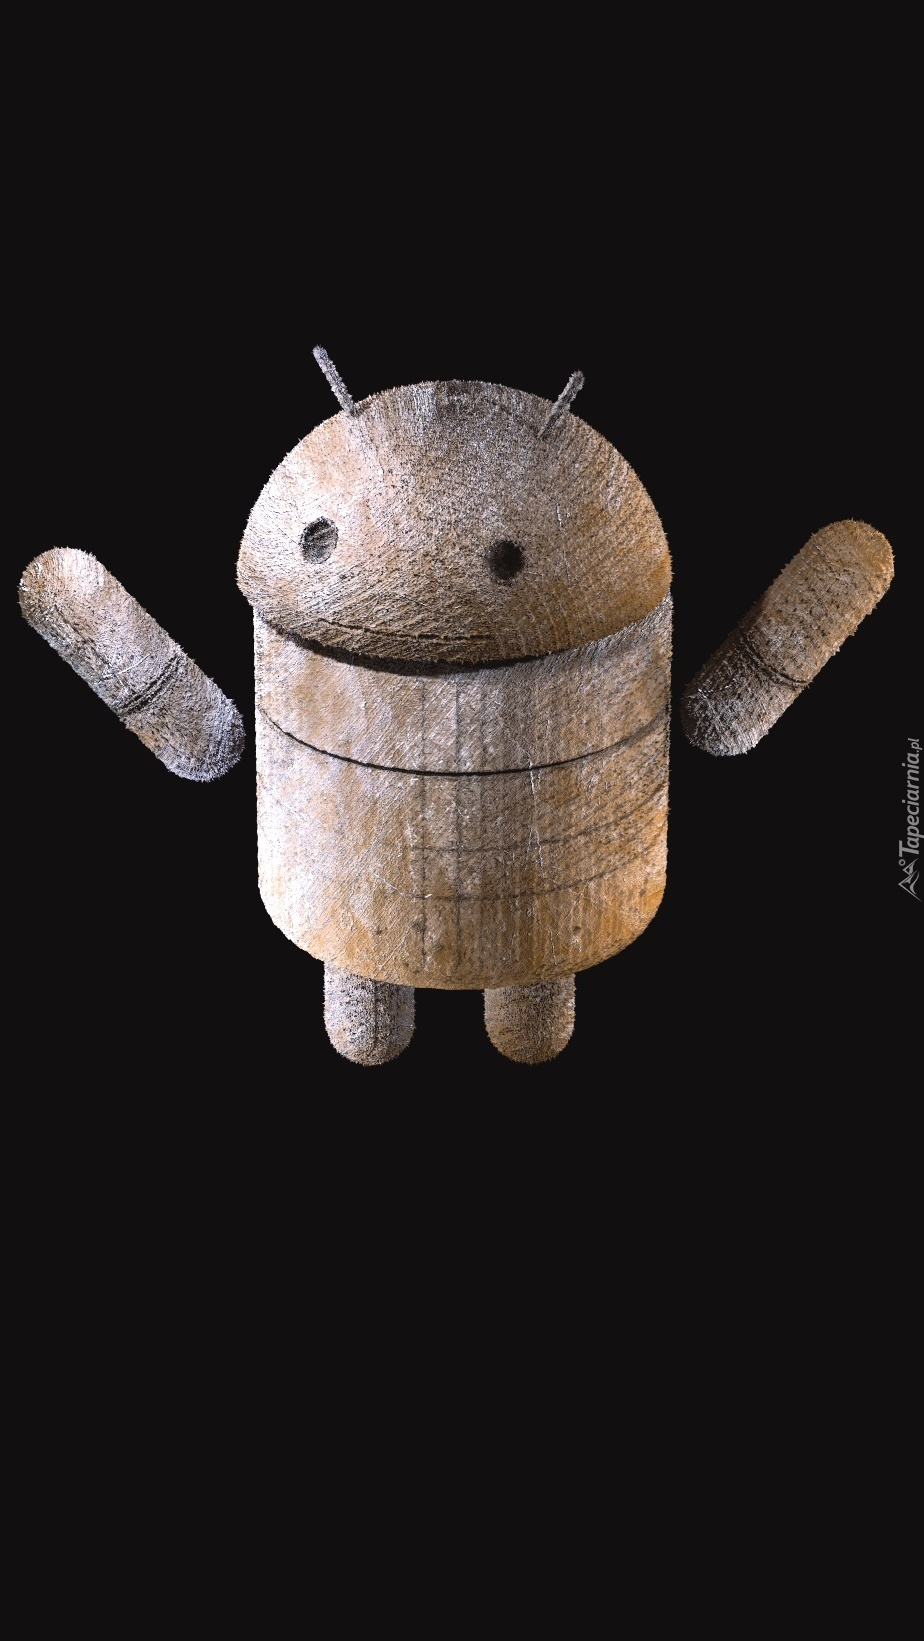 Android z drewna